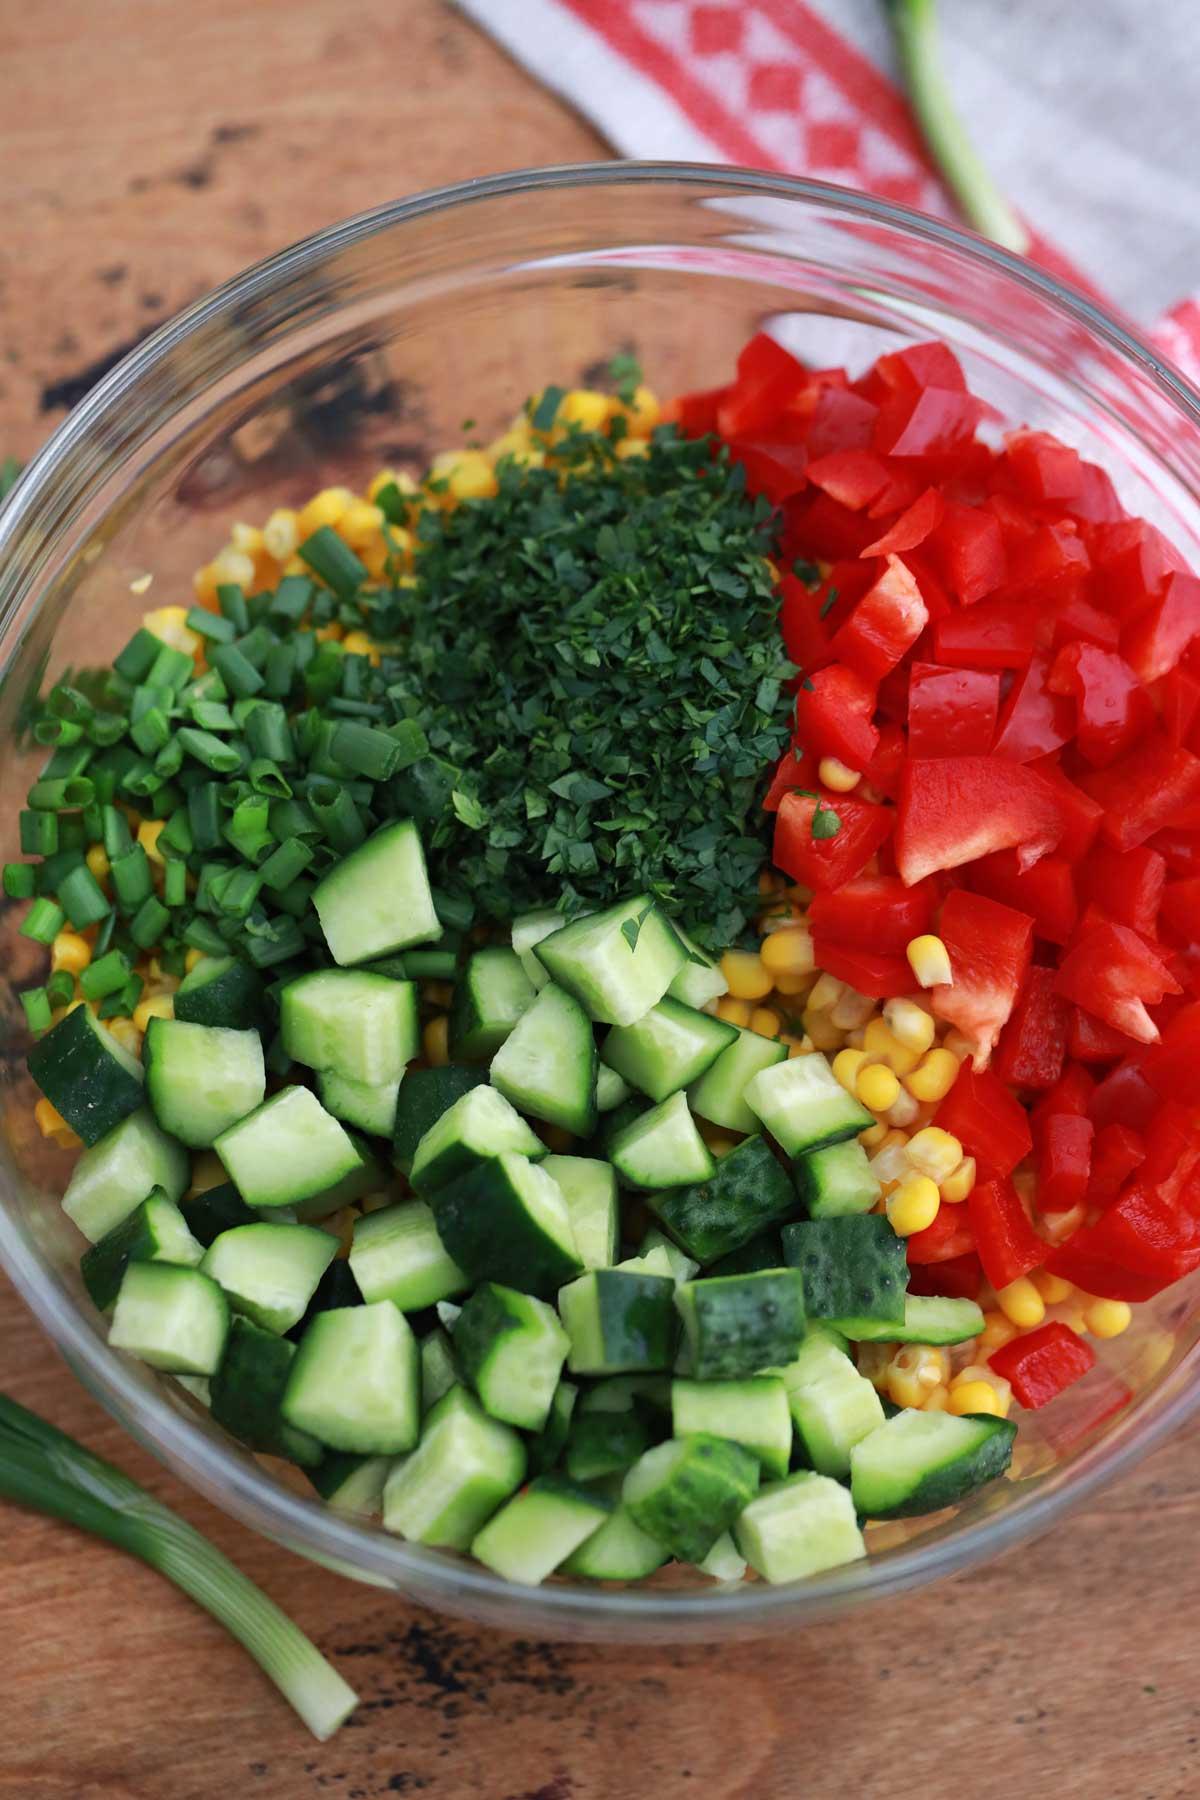 Glass bowl of vegetables